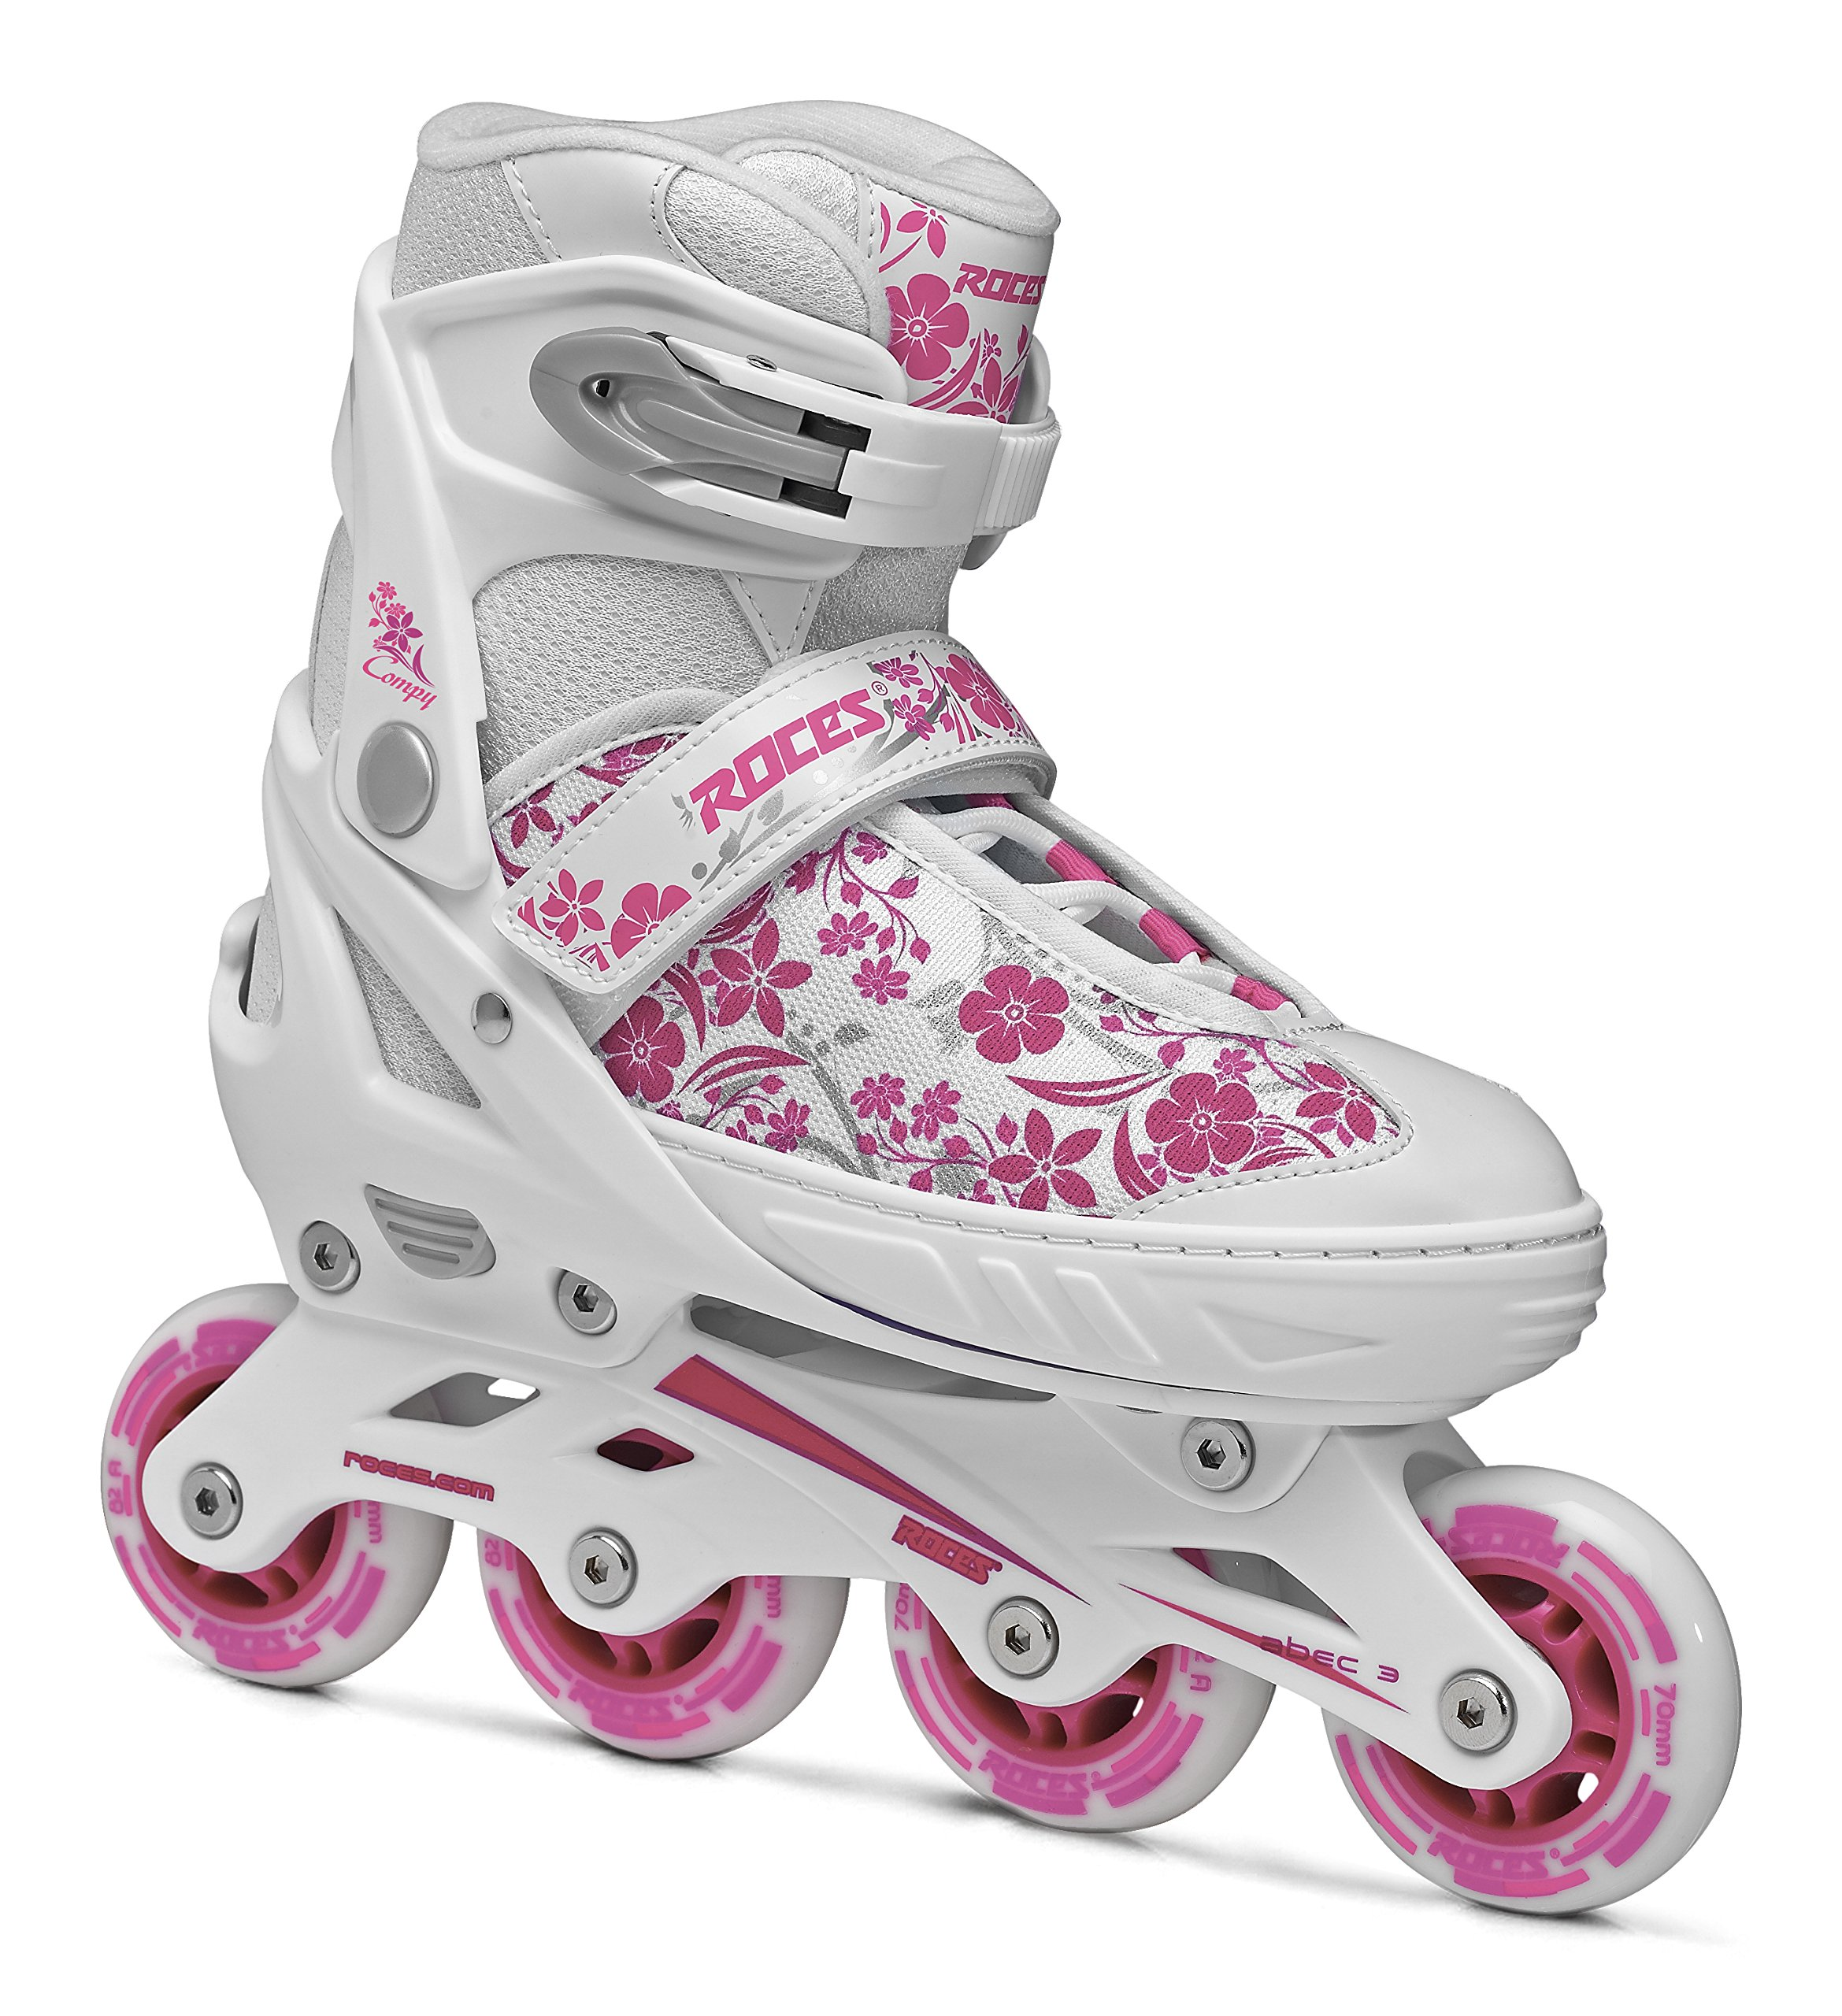 Roces 400809 Women's Model Compy 8.0 Adjustable Inline Skate, US 13jr-2, White/Violet